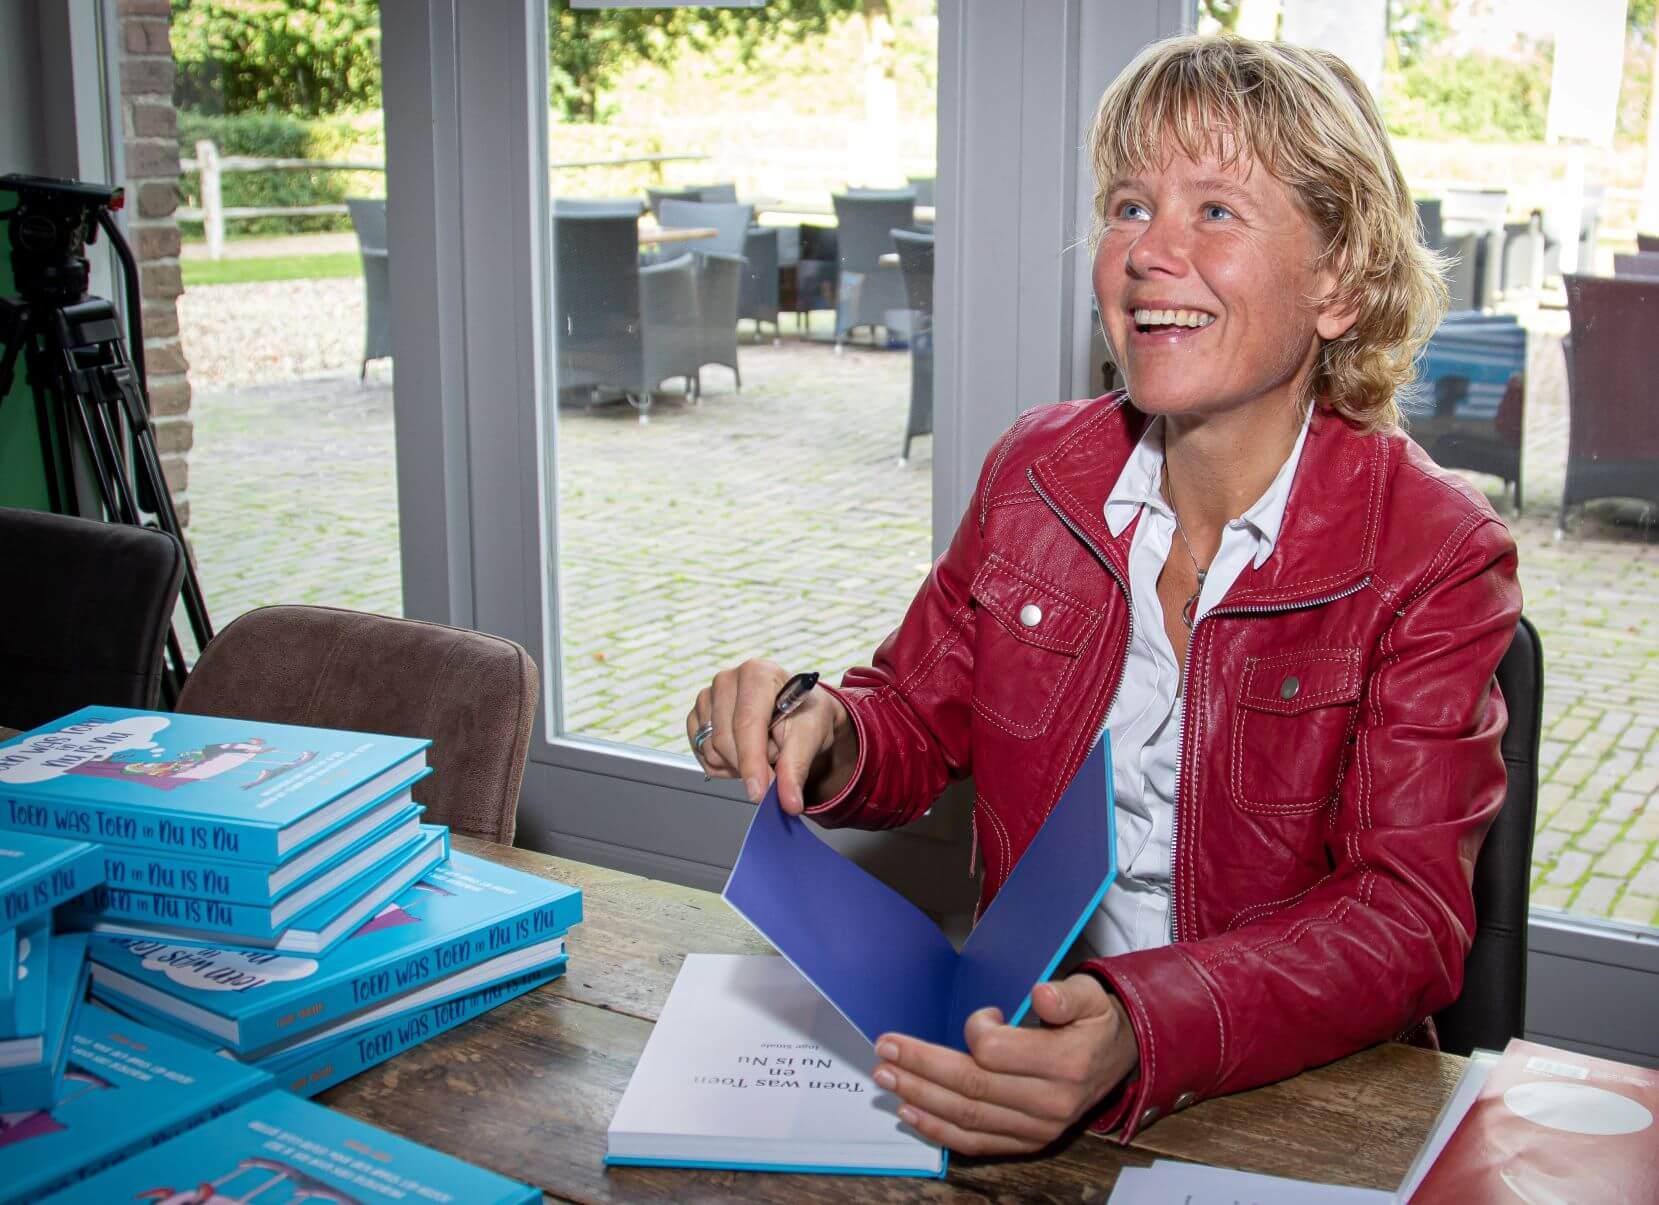 Signeersessie Inge Smale